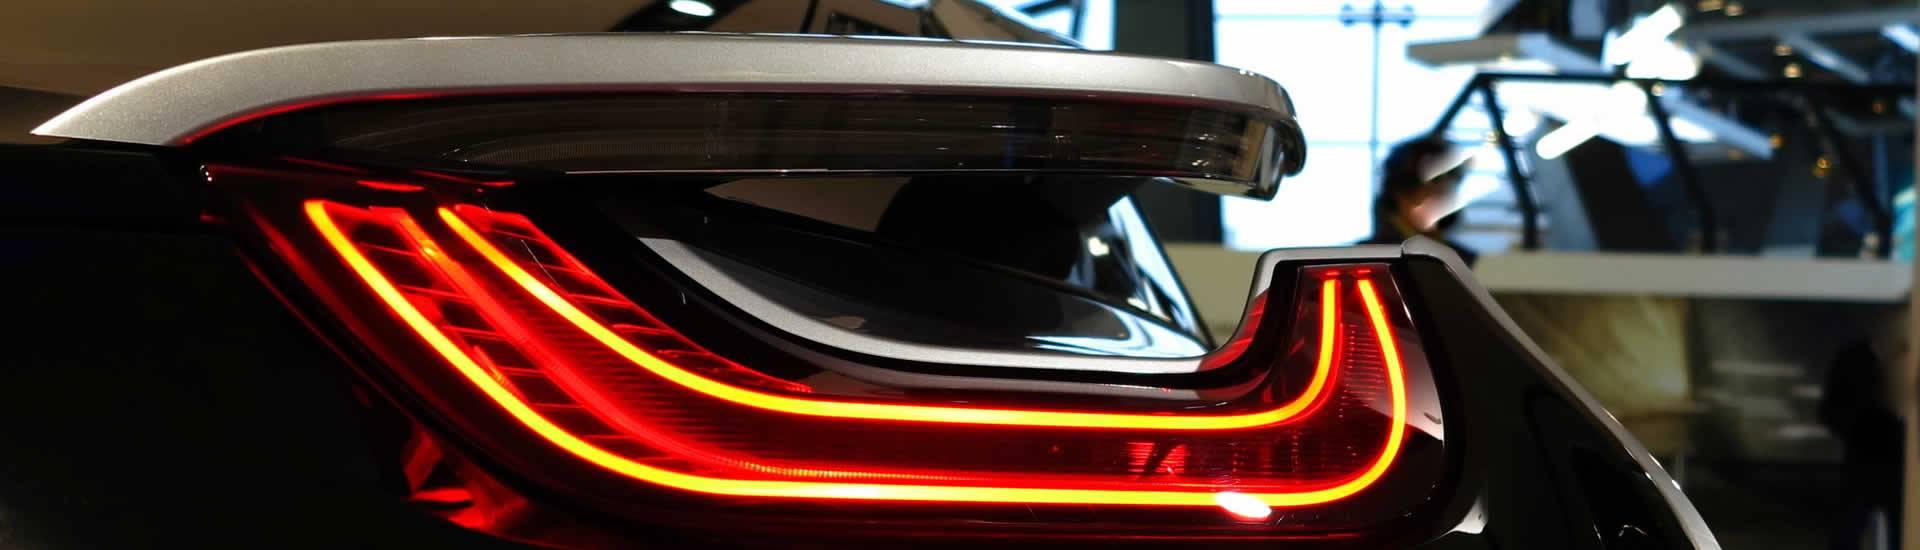 Automotive i82